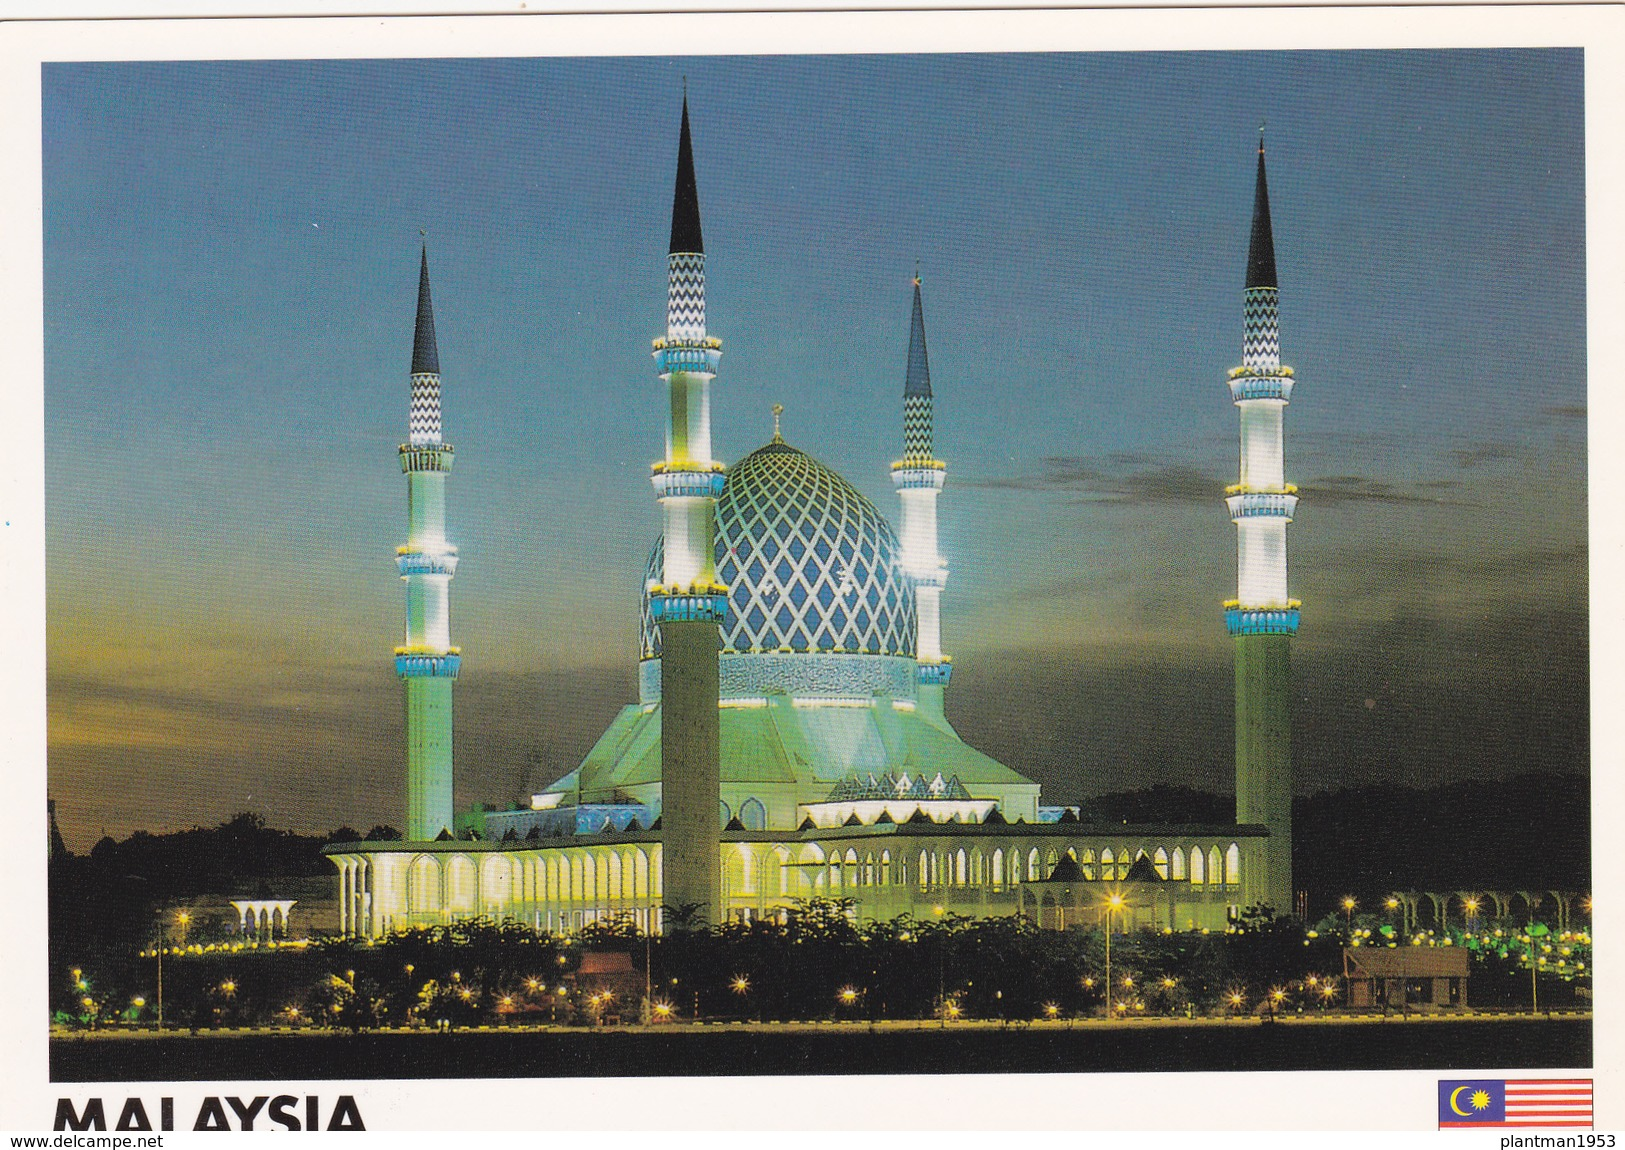 Big Postcard Of A Sultan Sallahuddin Mosque In Shah Alam,Malaysia..,Size=170mmx120mm.APROX,L42. - Malaysia